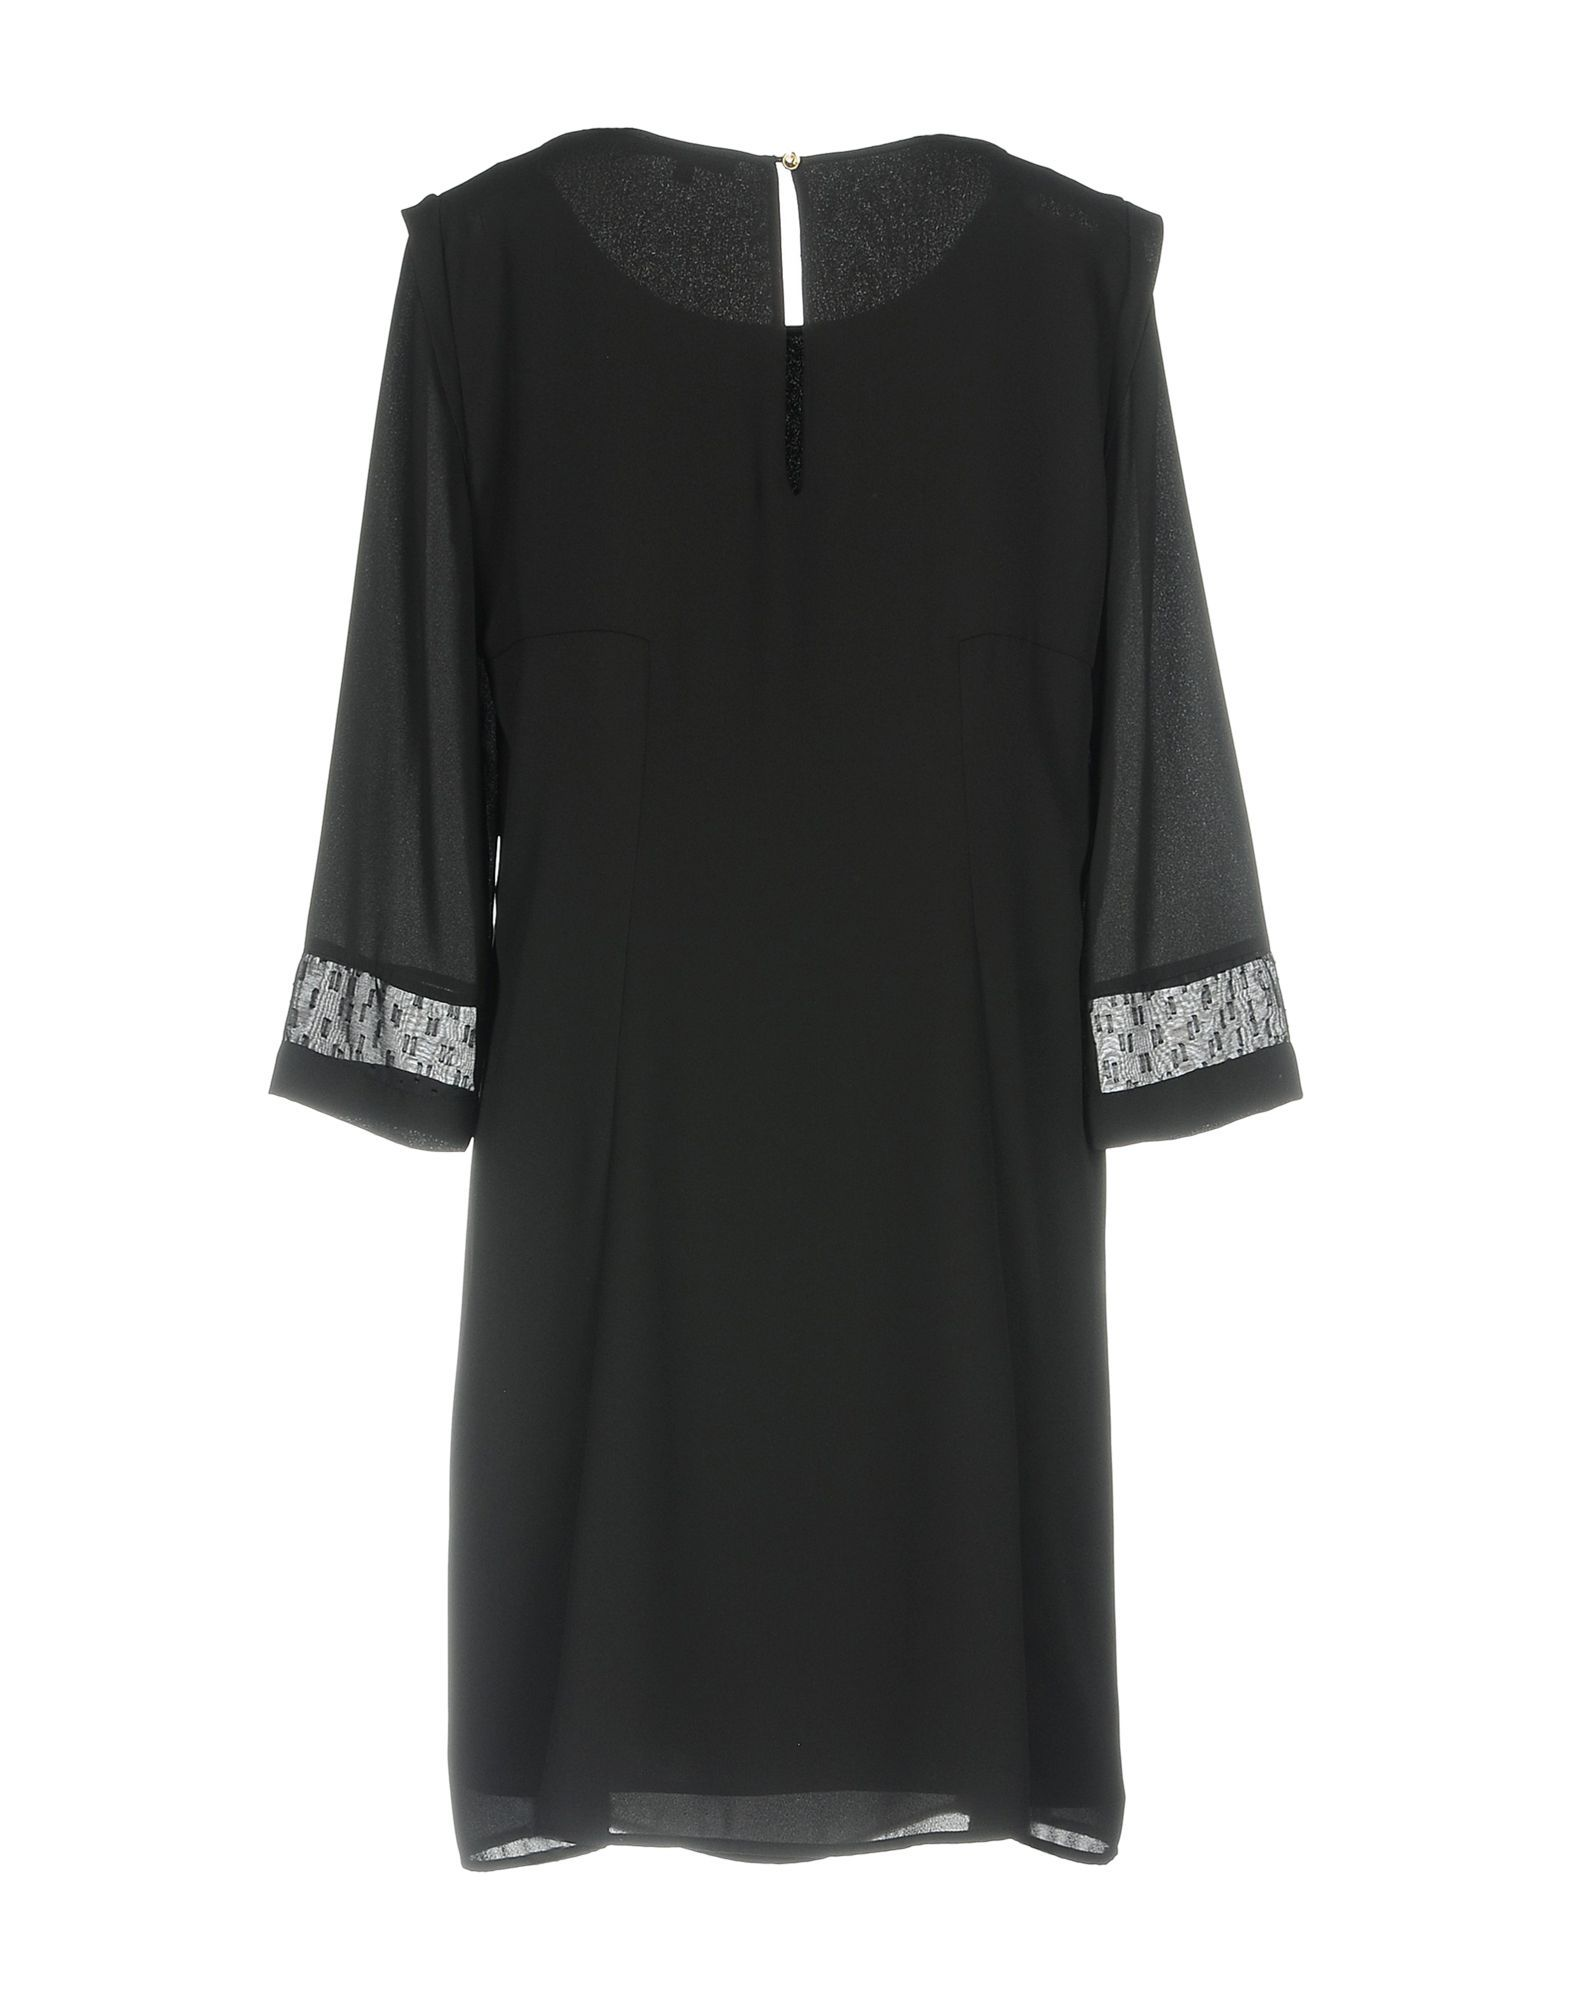 Patrizia Pepe Black Crepe Three Quarter Sleeve Dress